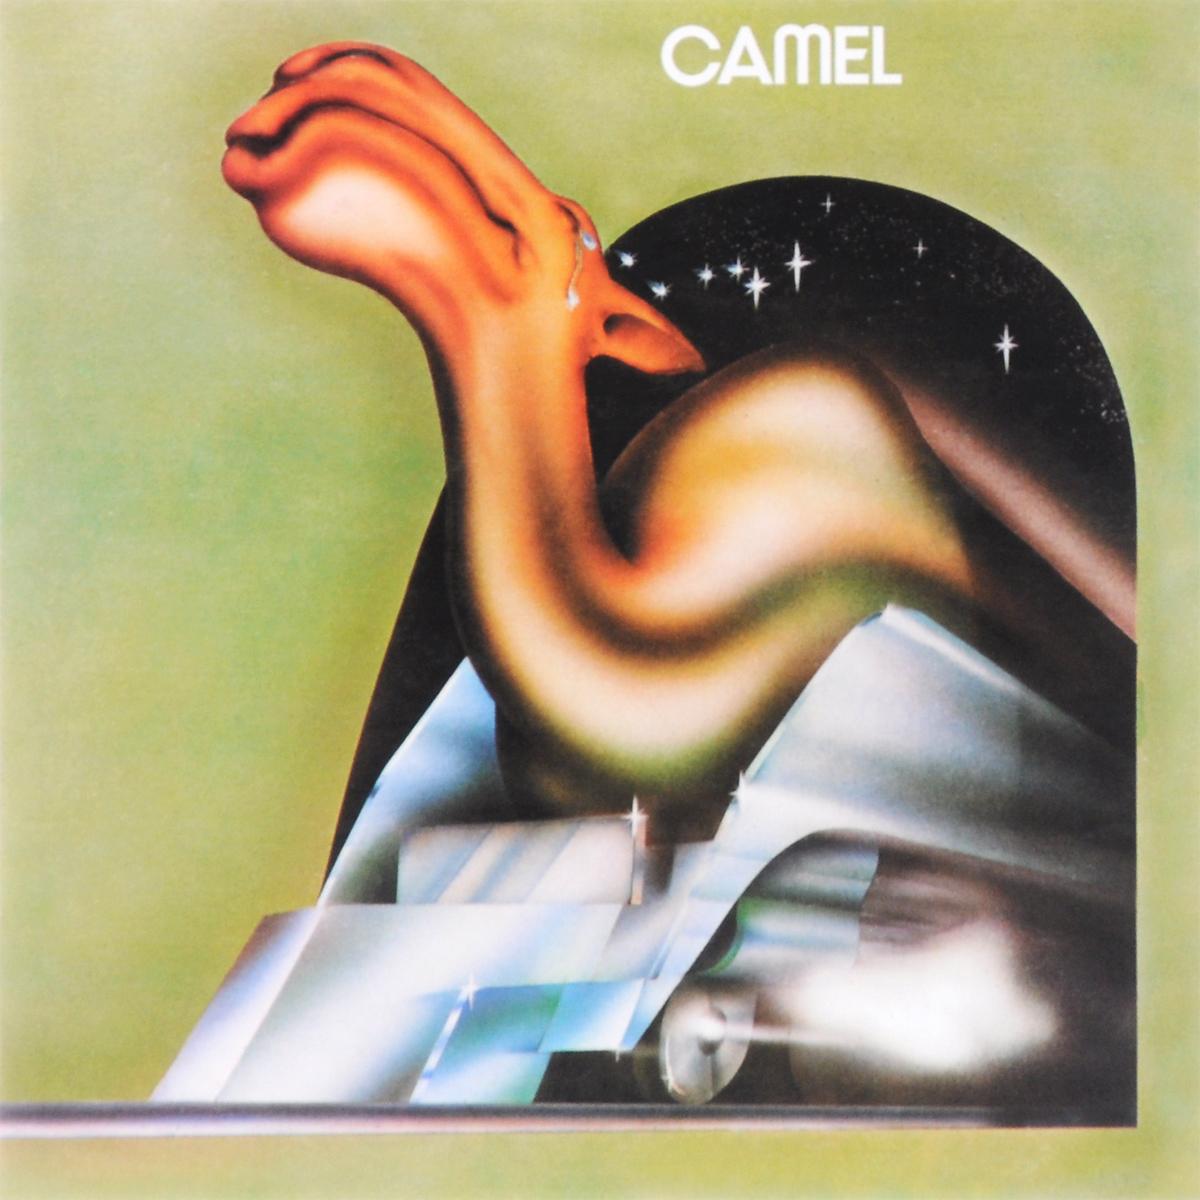 Camel Camel. Camel camel southampton